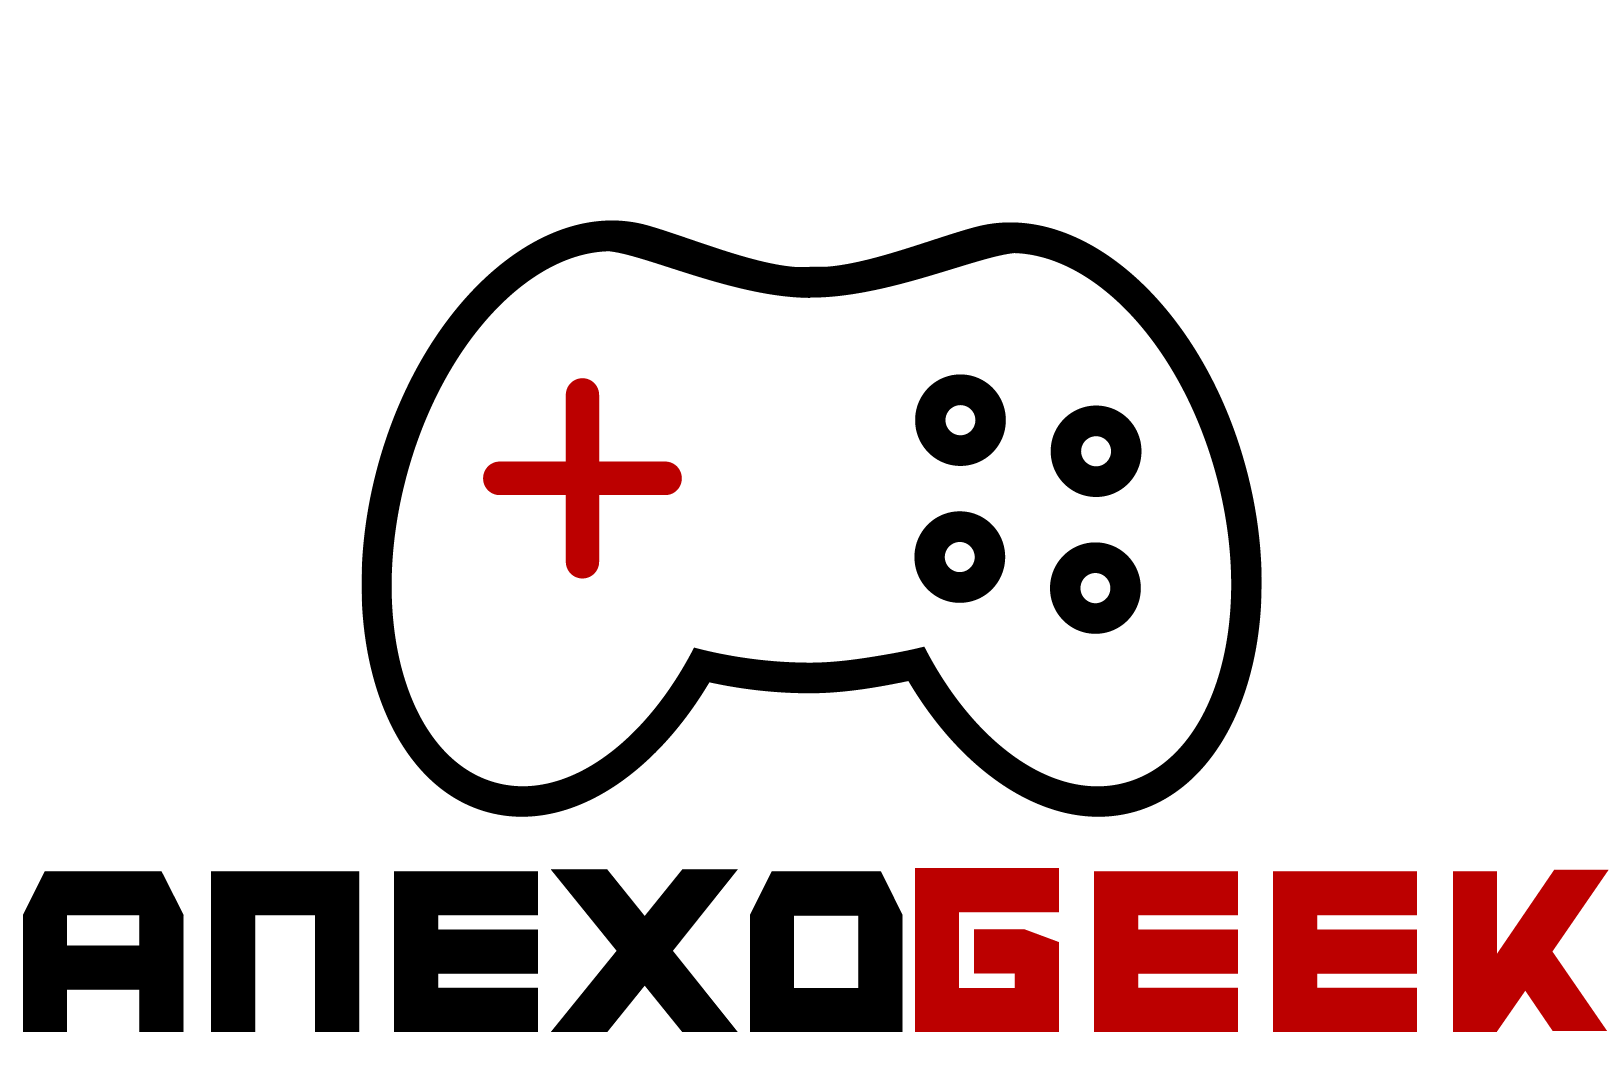 Anexo Geek